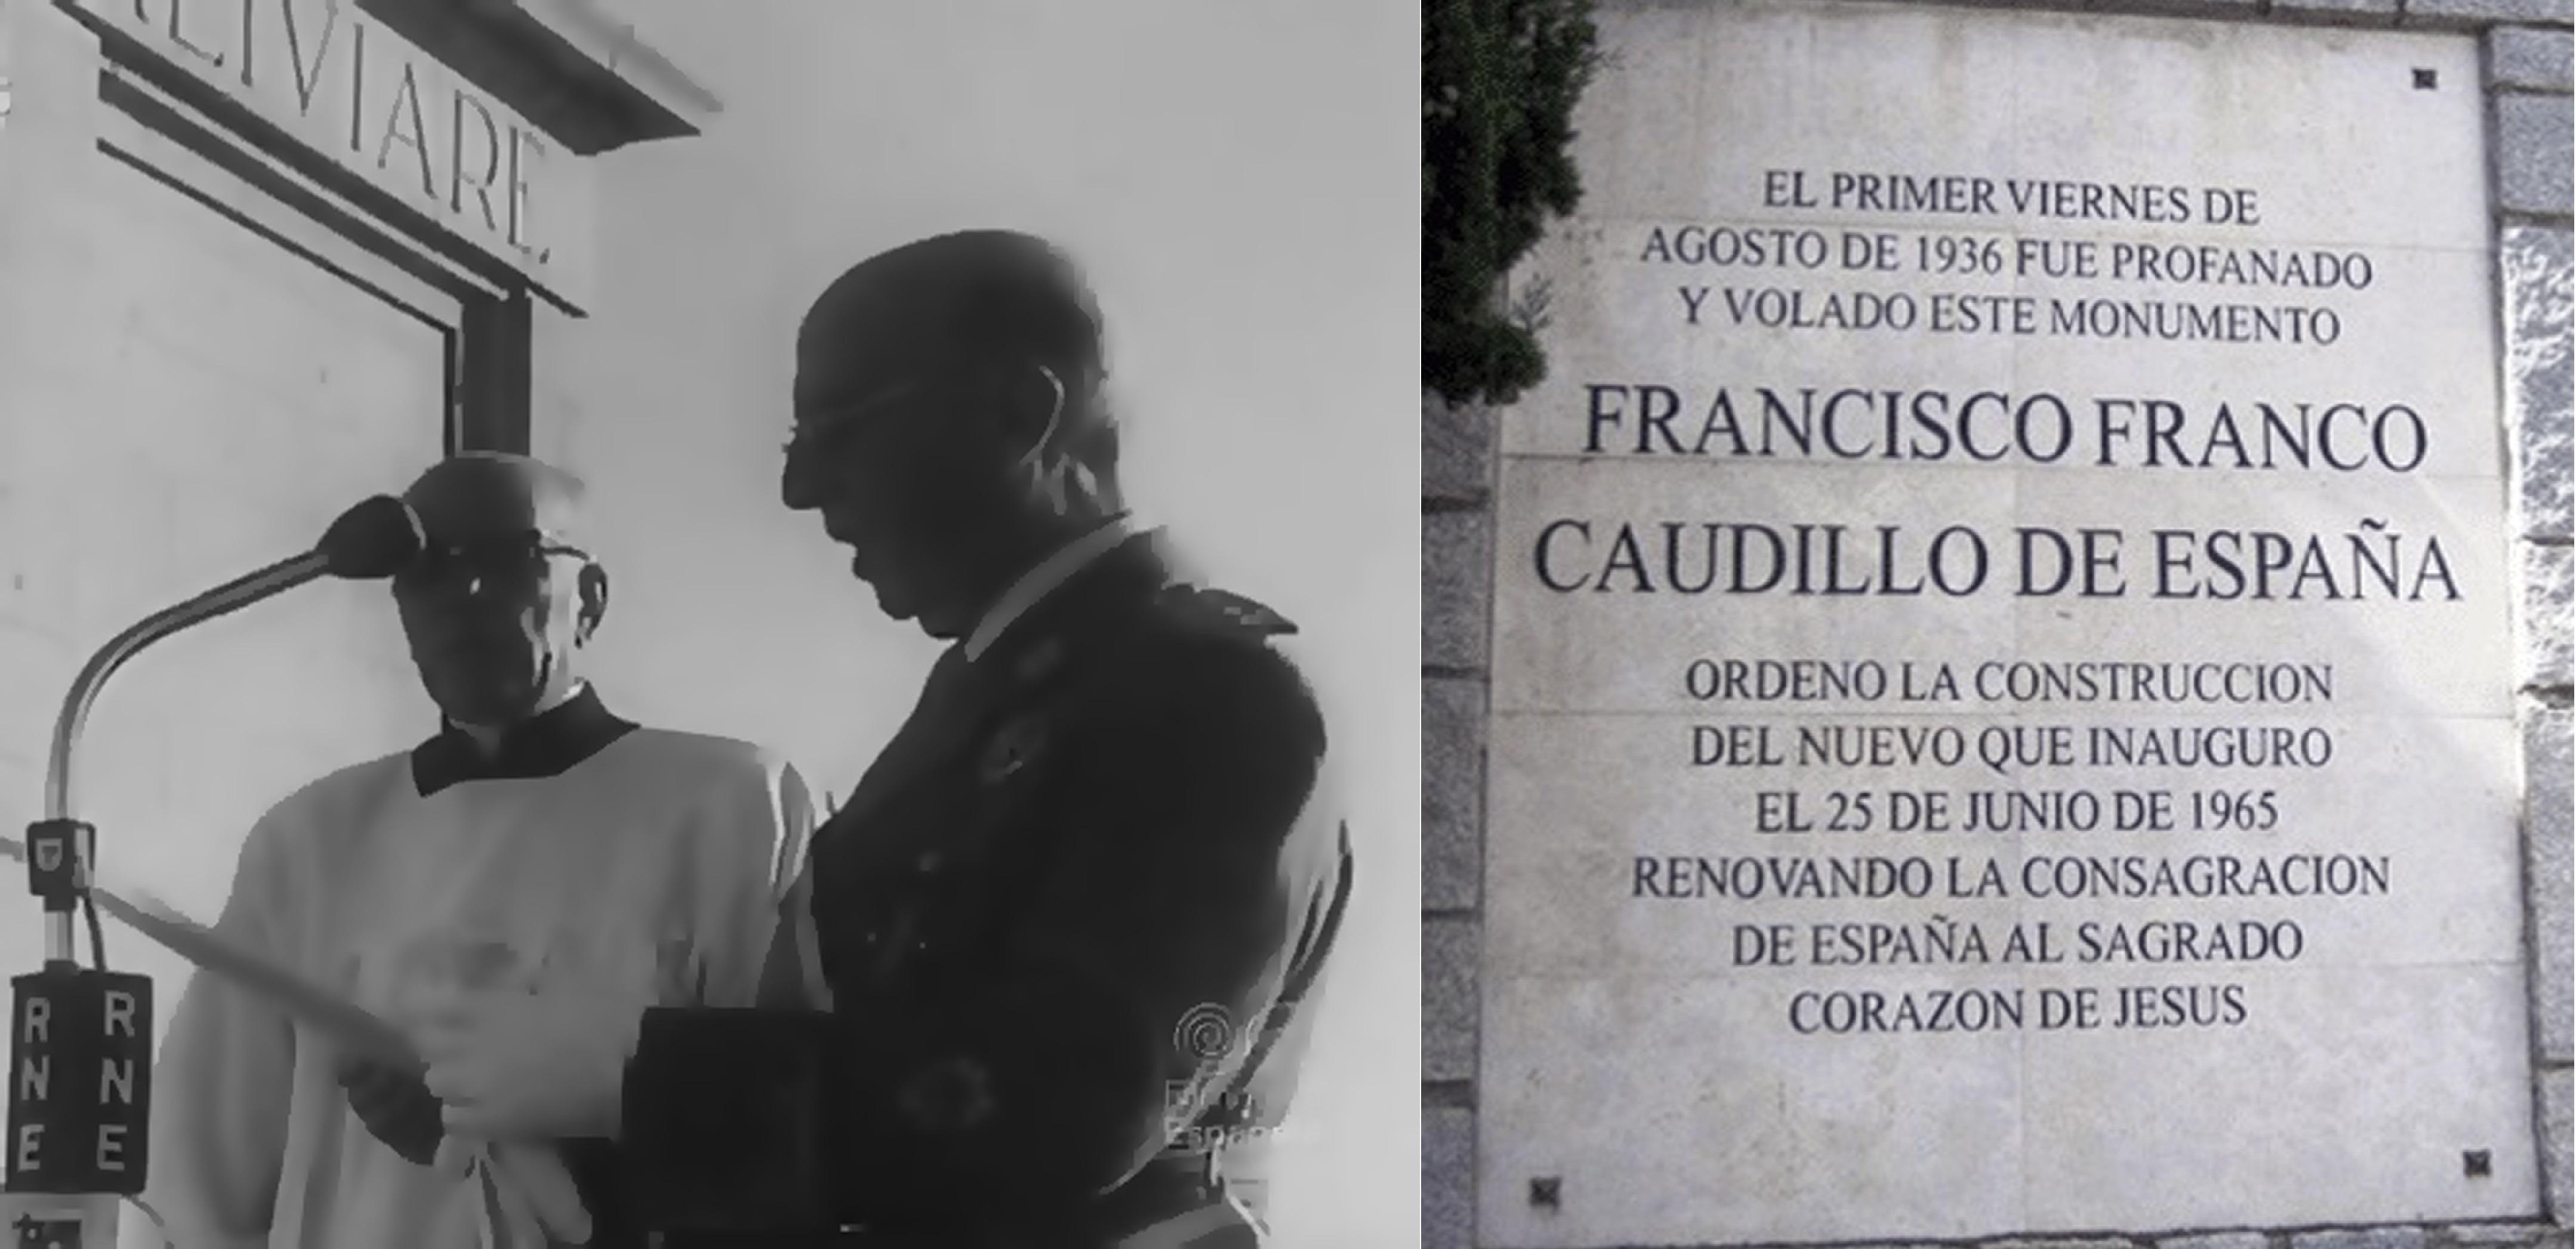 franco_cerro_angeles+2